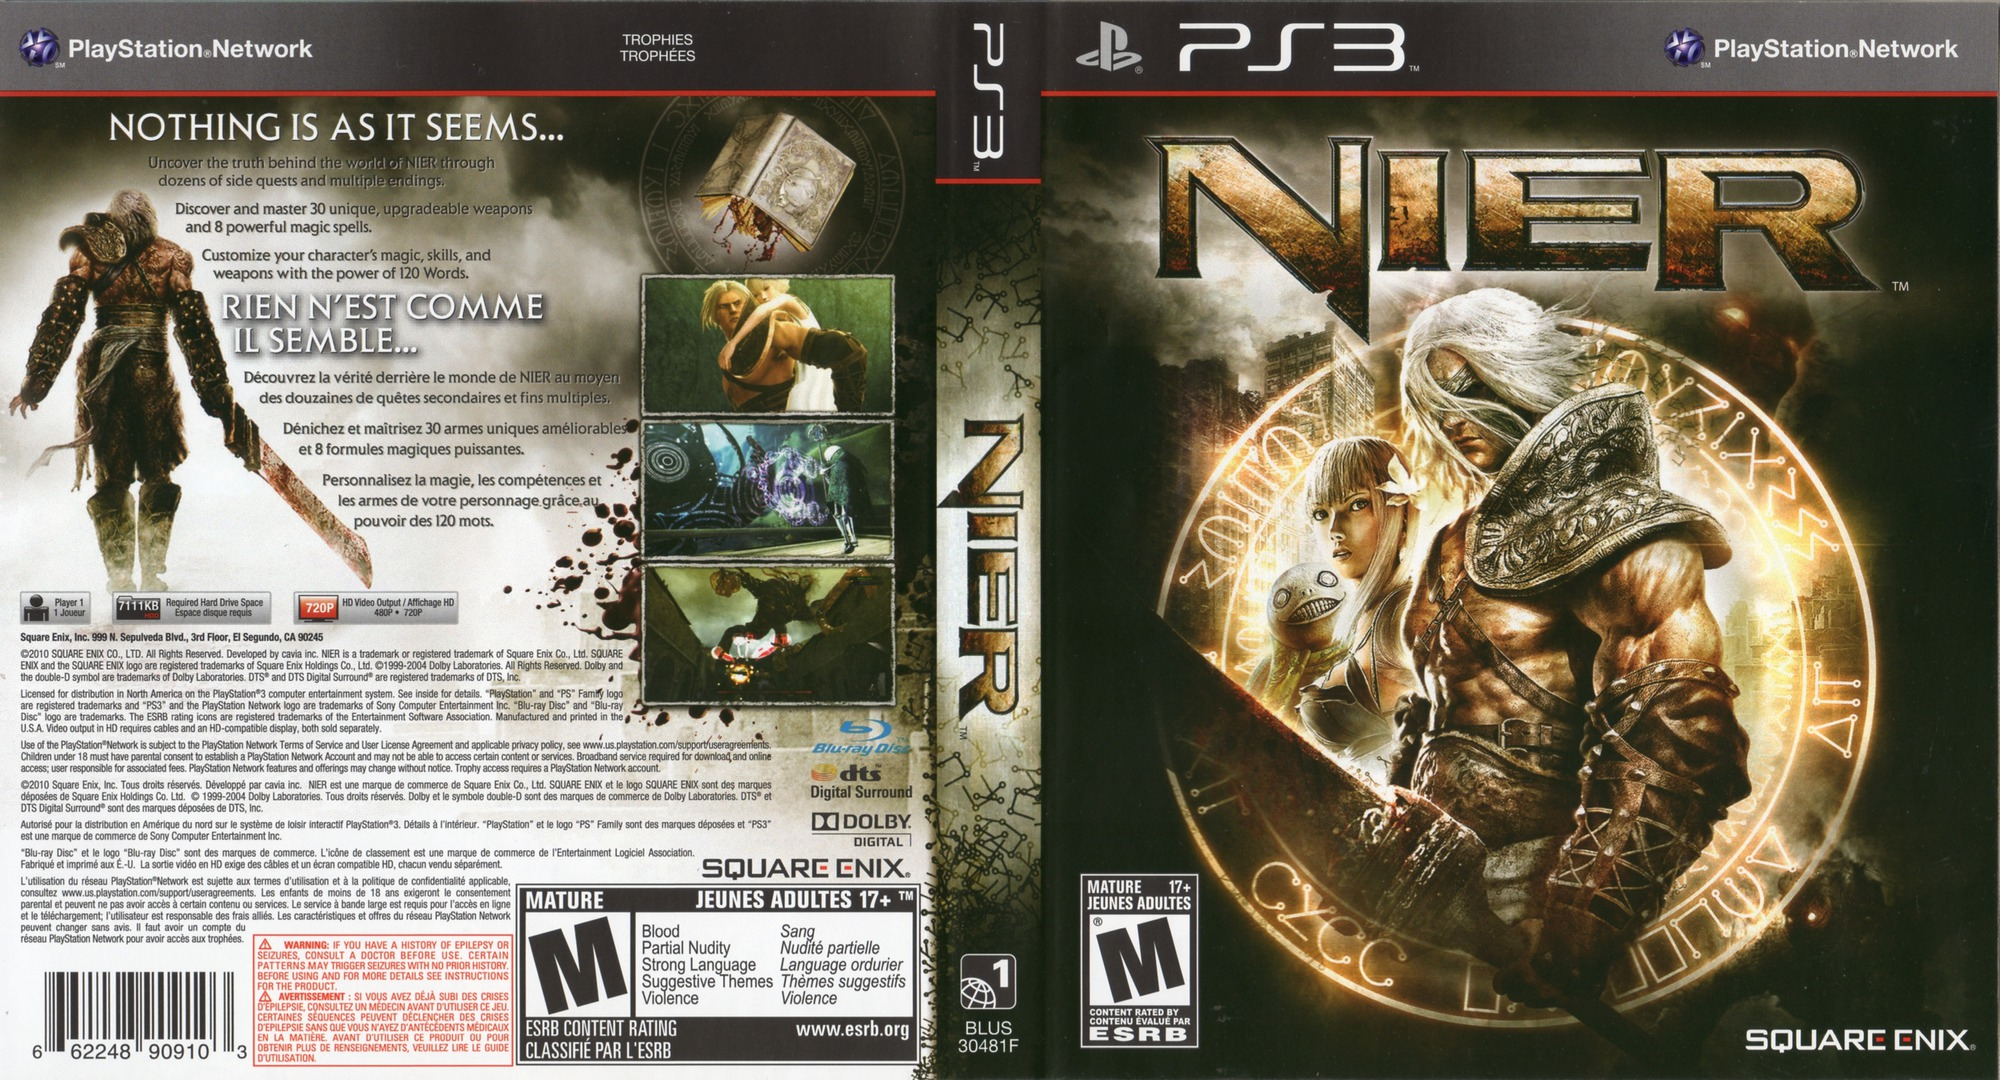 Nier PS3 coverfullHQ2 (BLUS30481)